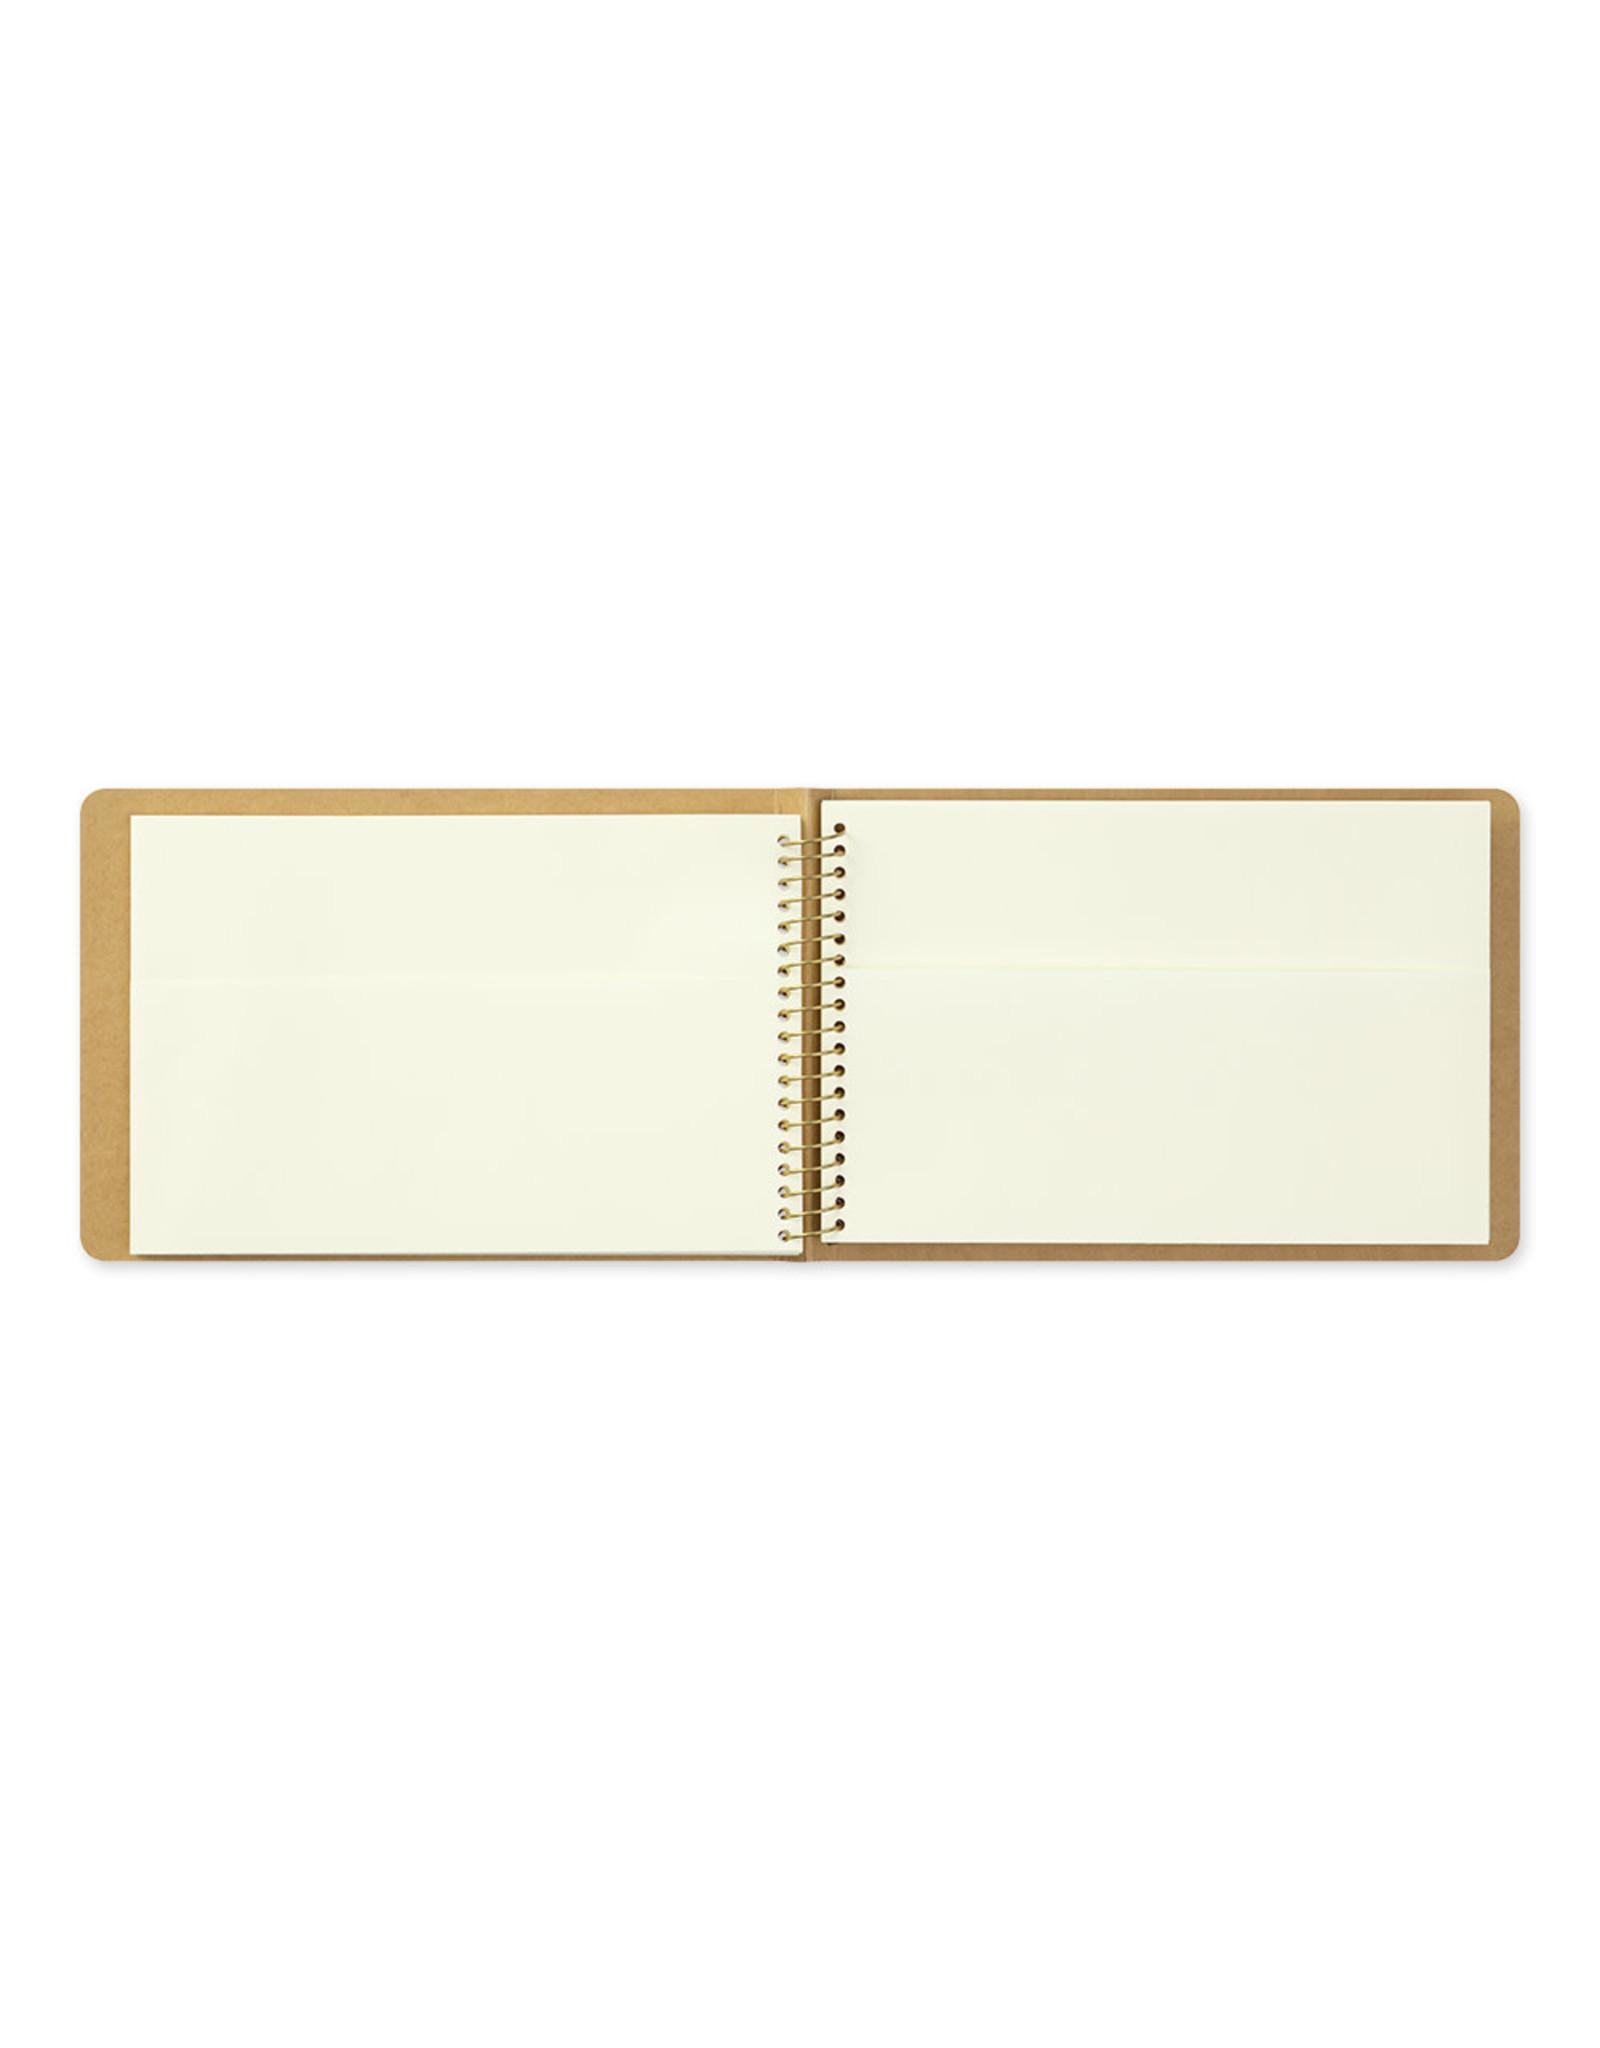 Traveler's Company SPIRAL RING NOTEBOOK B6 PAPER POCKET 16 SHEETS (32 POCKETS)